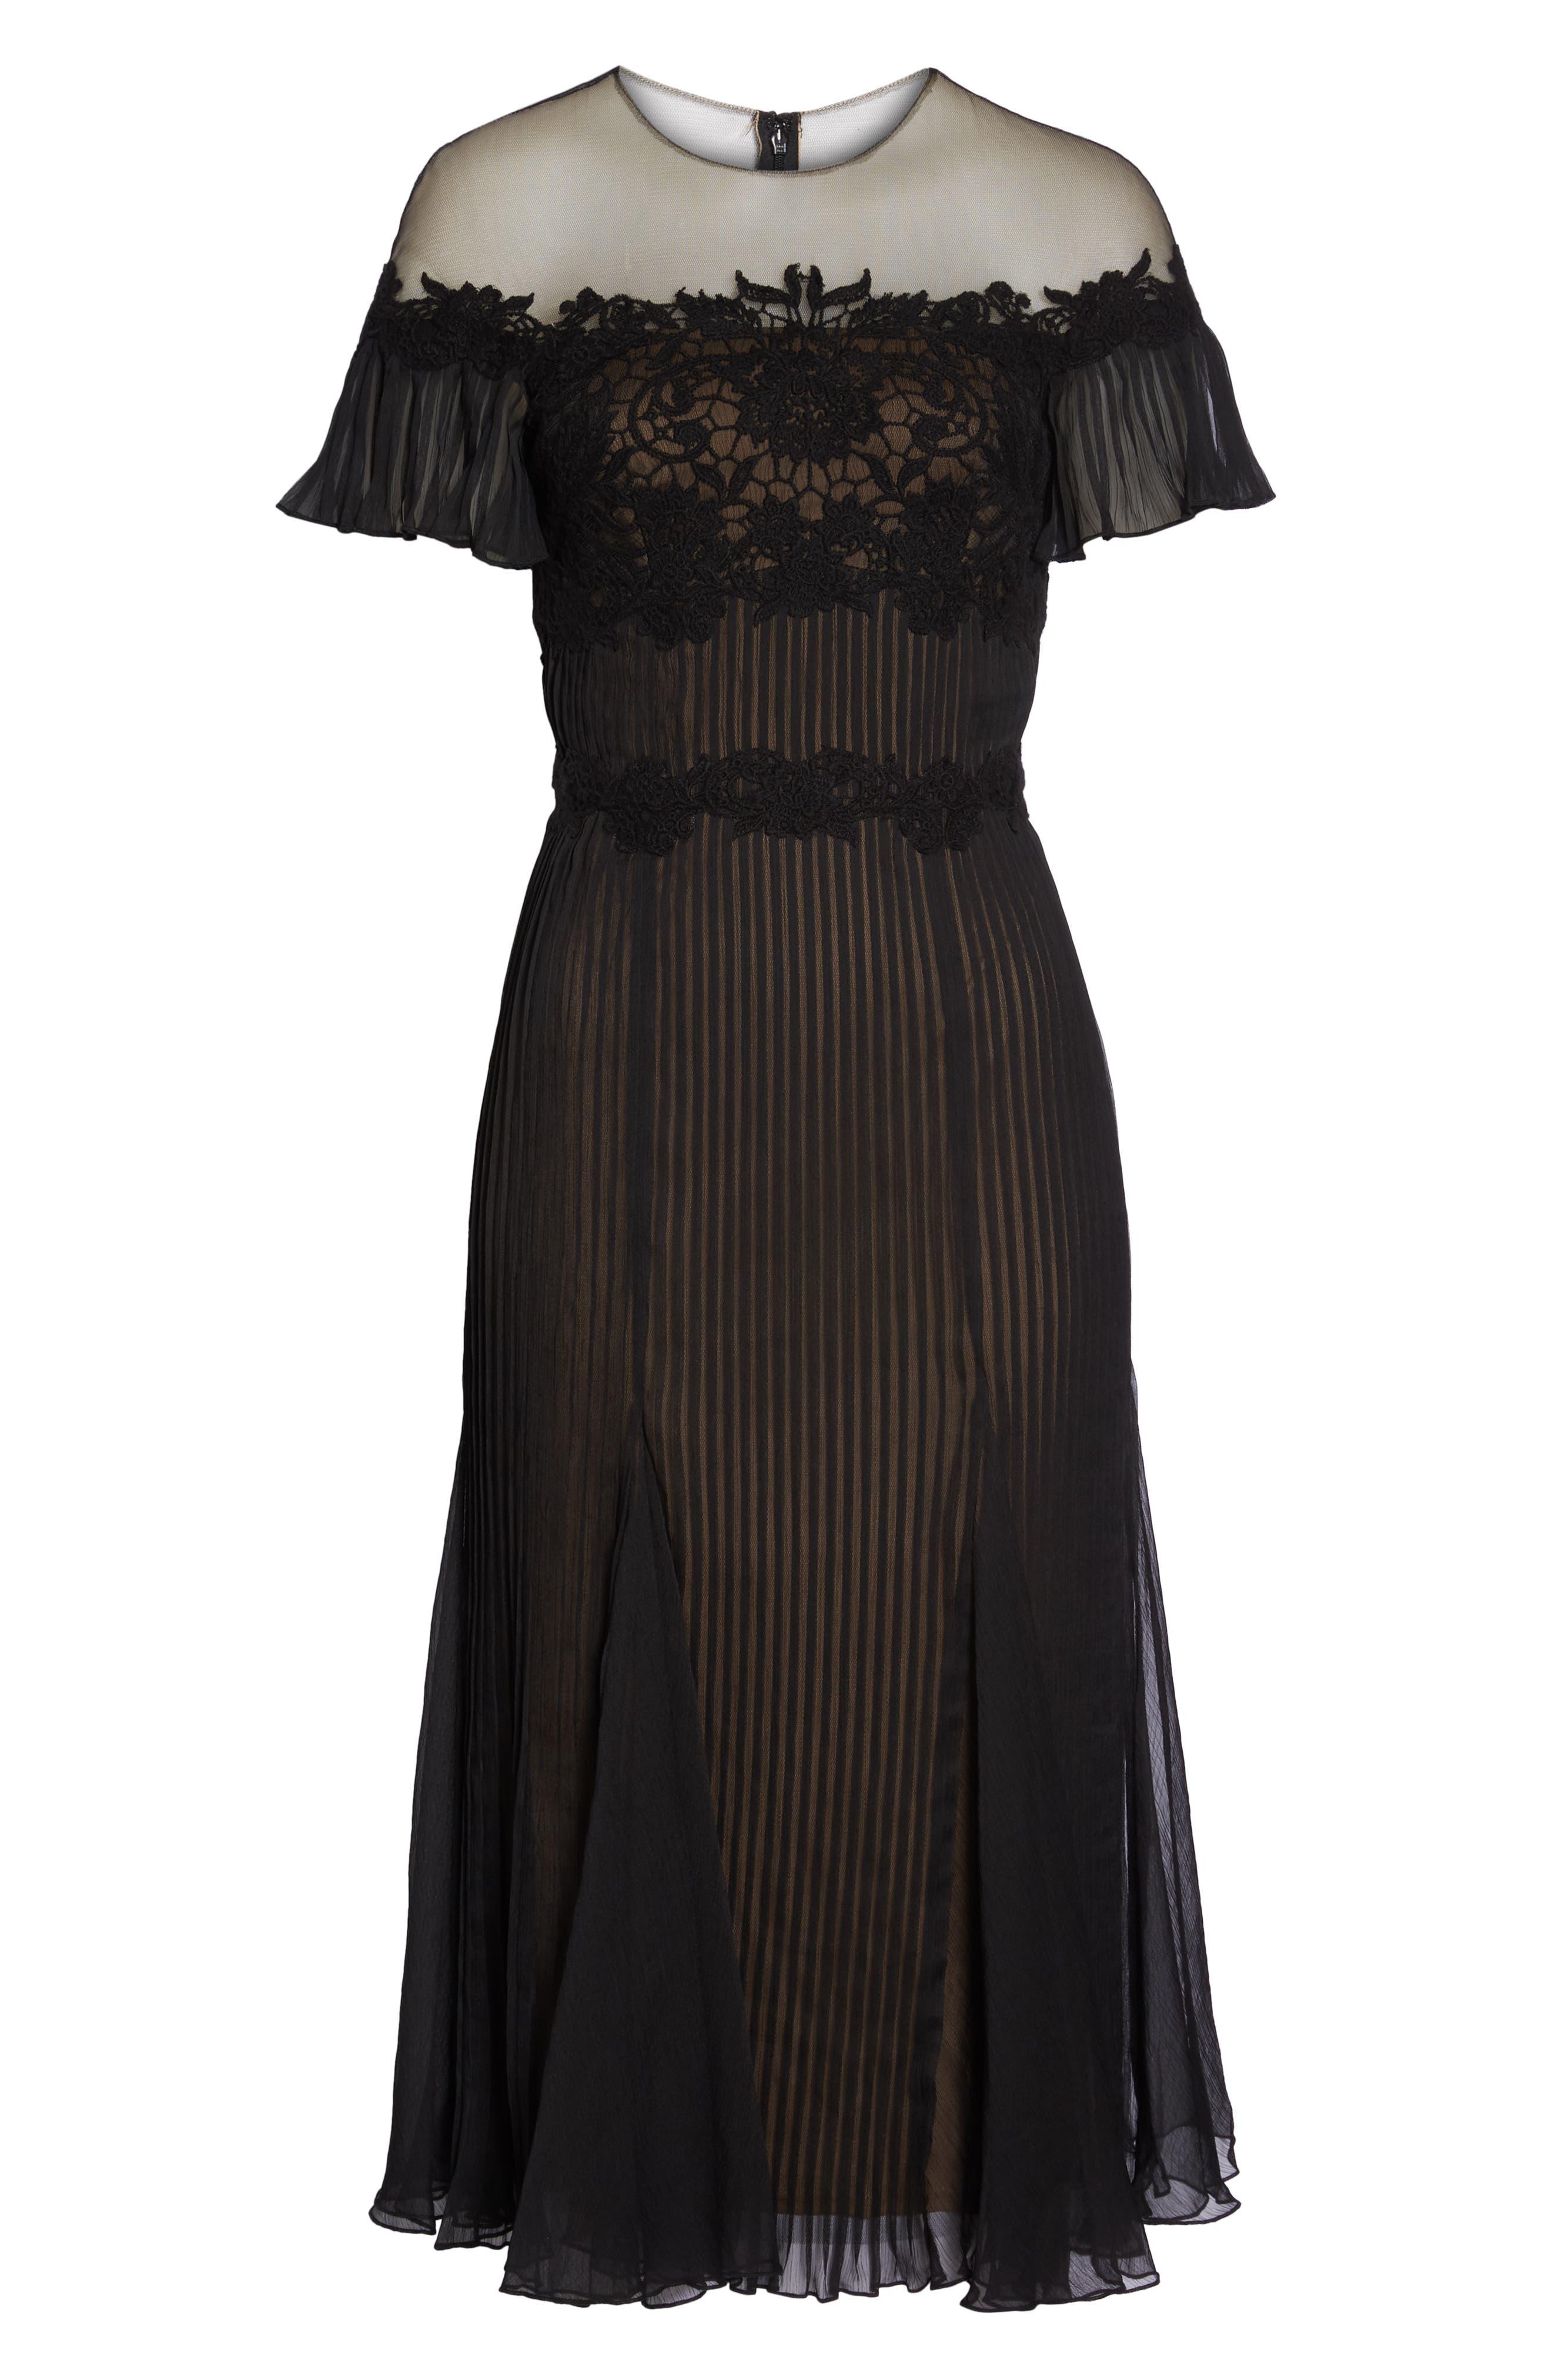 Lace & Chiffon A-Line Dress,                             Alternate thumbnail 6, color,                             Black/ Nude